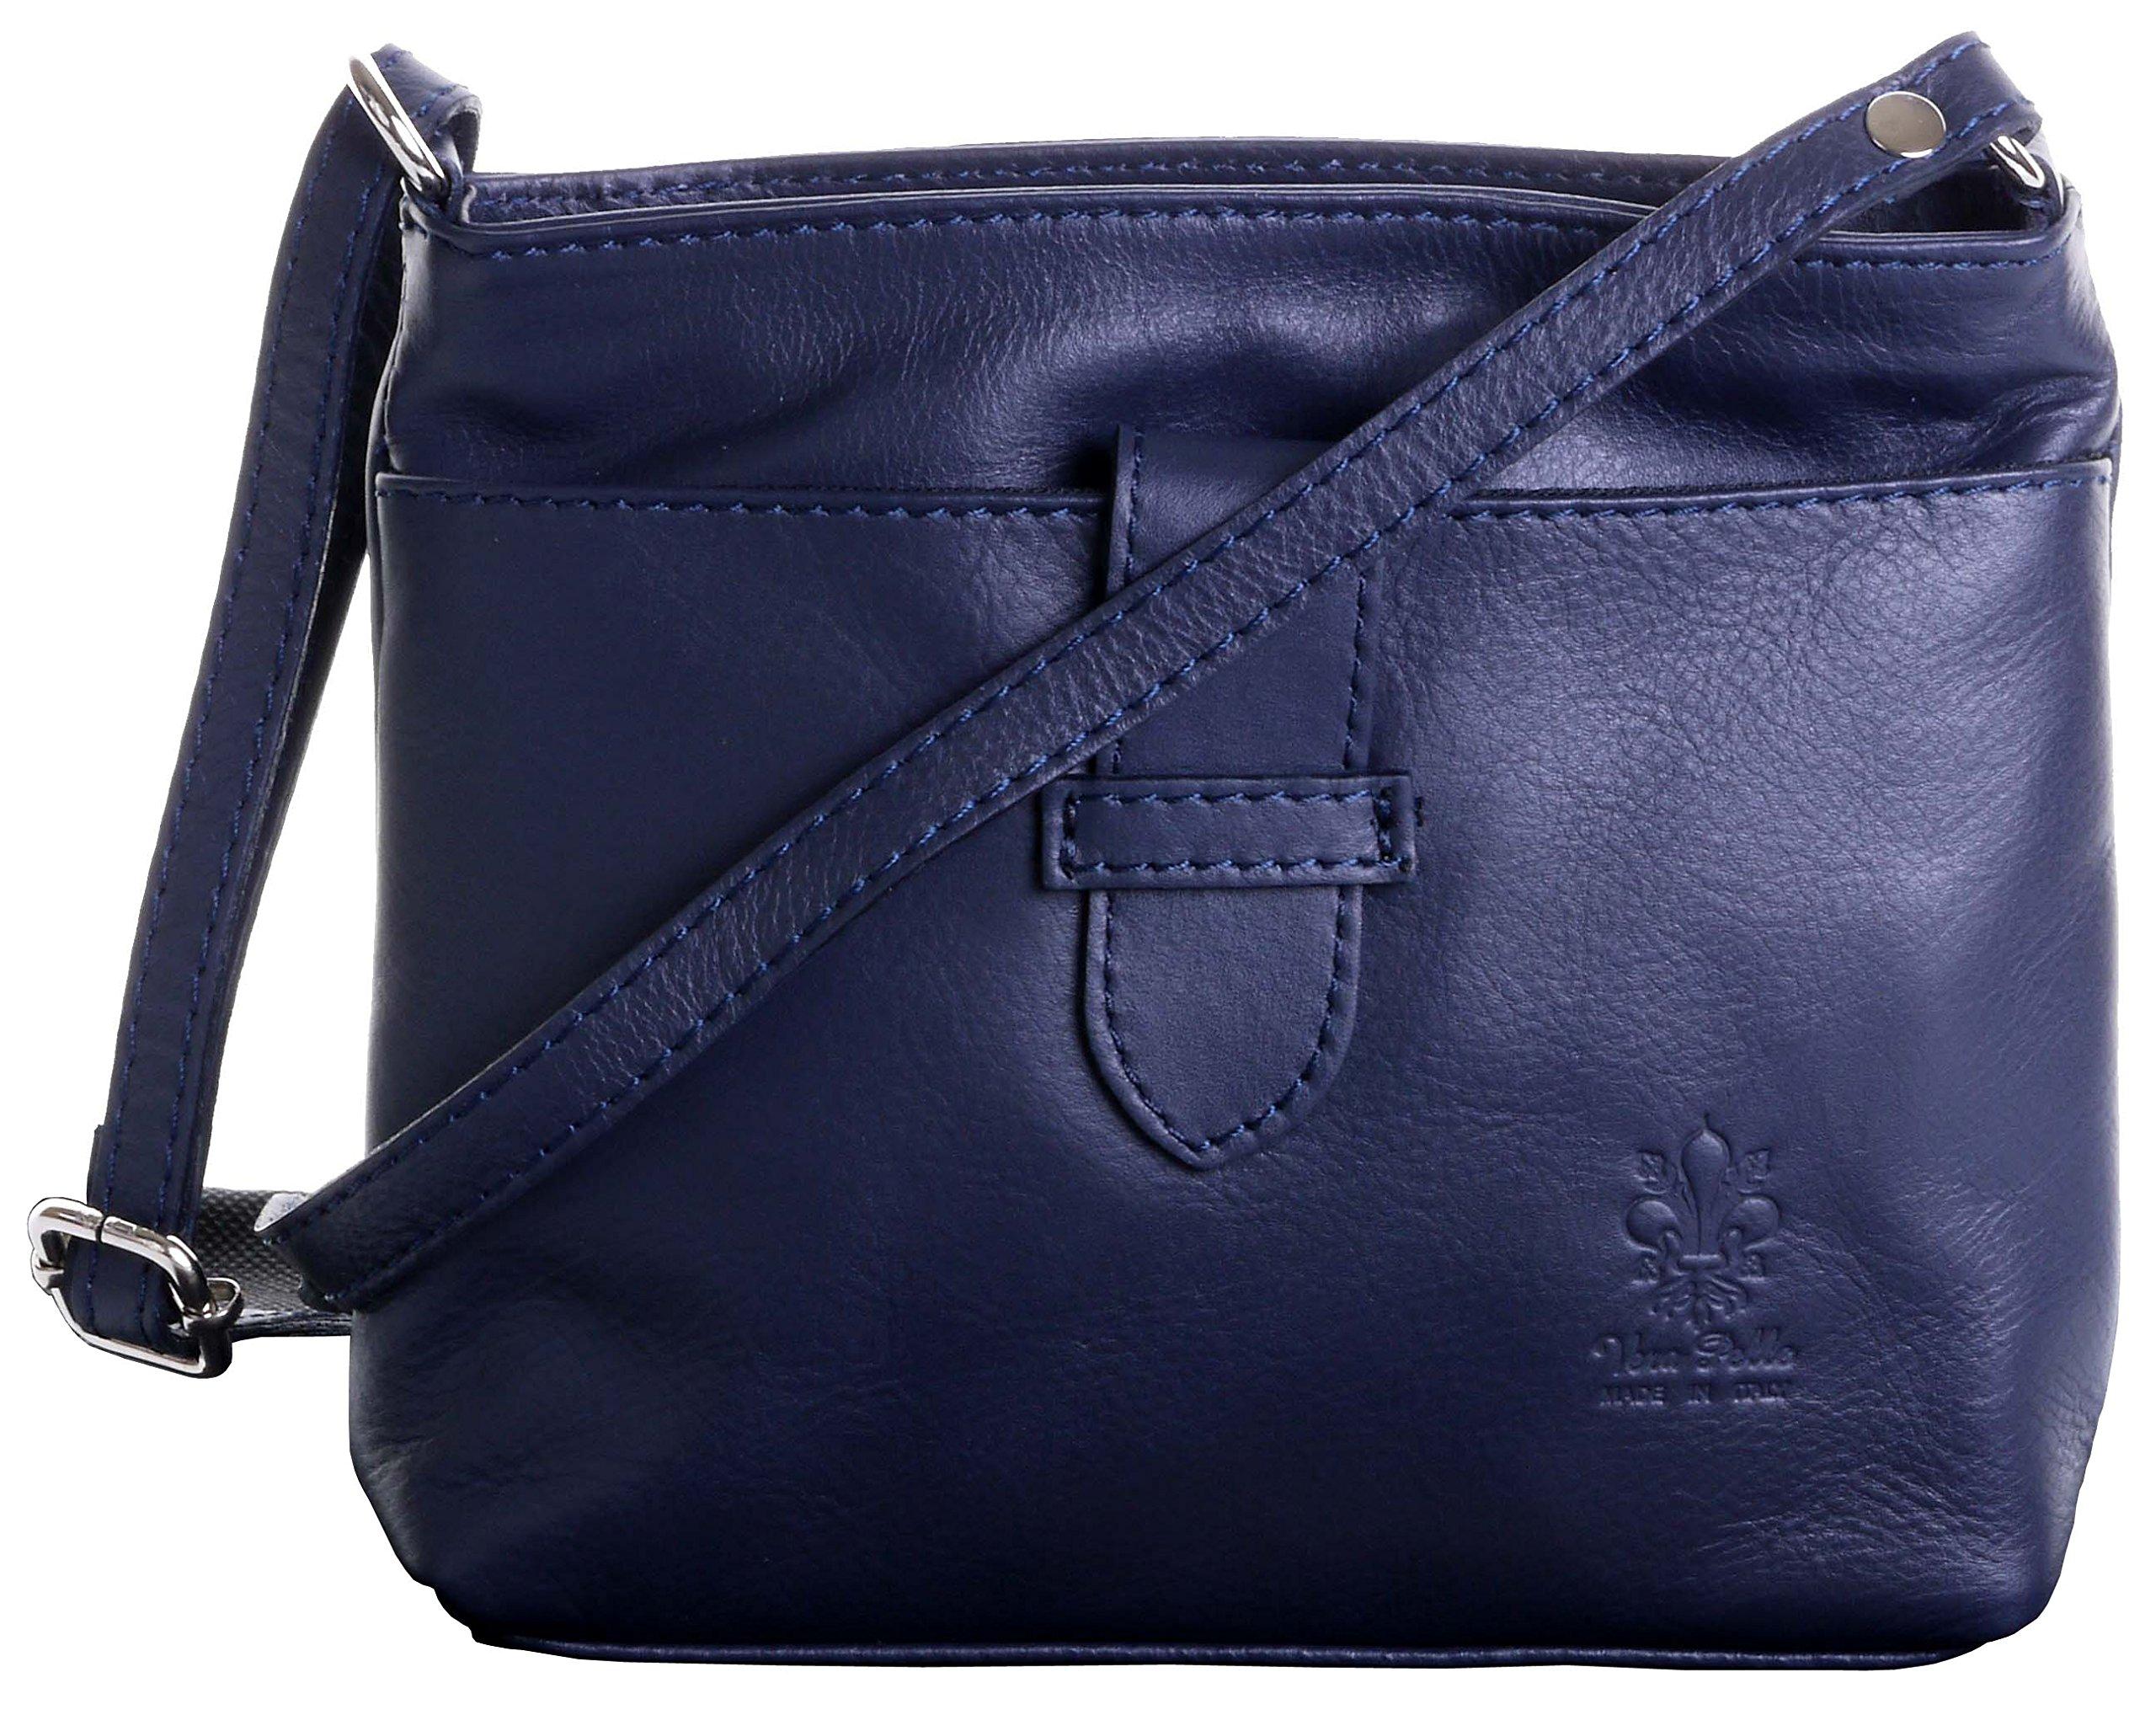 Primo Sacchi Italian Soft Leather Small Navy Blue Adjustable Strap Cross Body Shoulder Bag